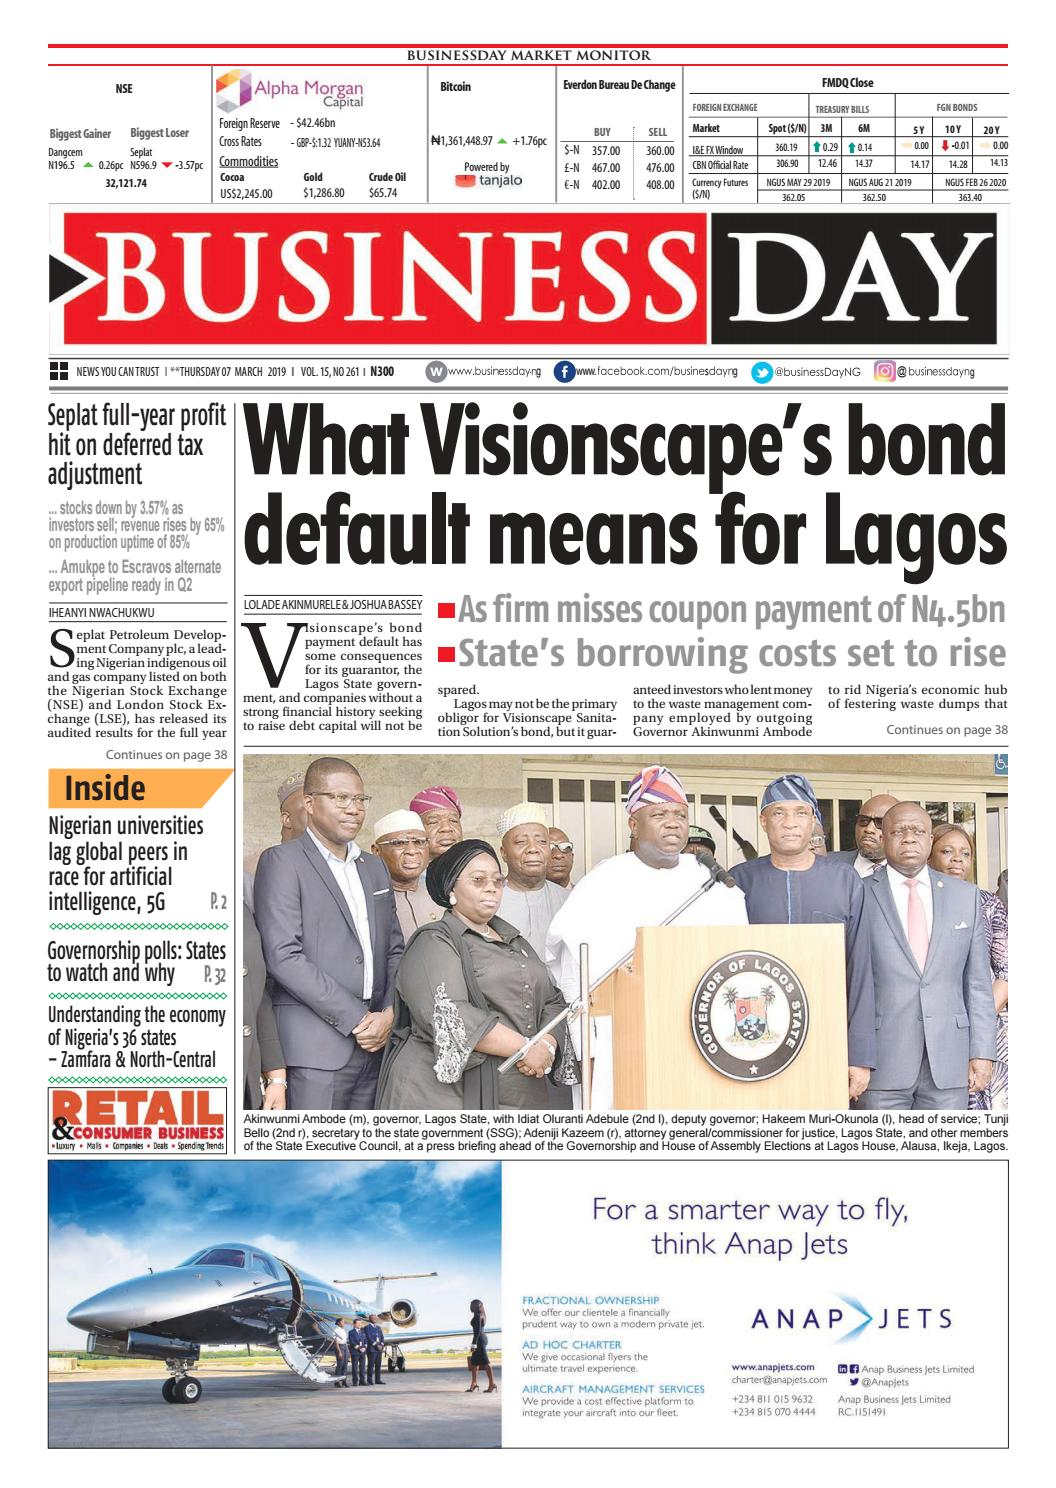 BusinessDay 07 Mar 2019 by BusinessDay - issuu